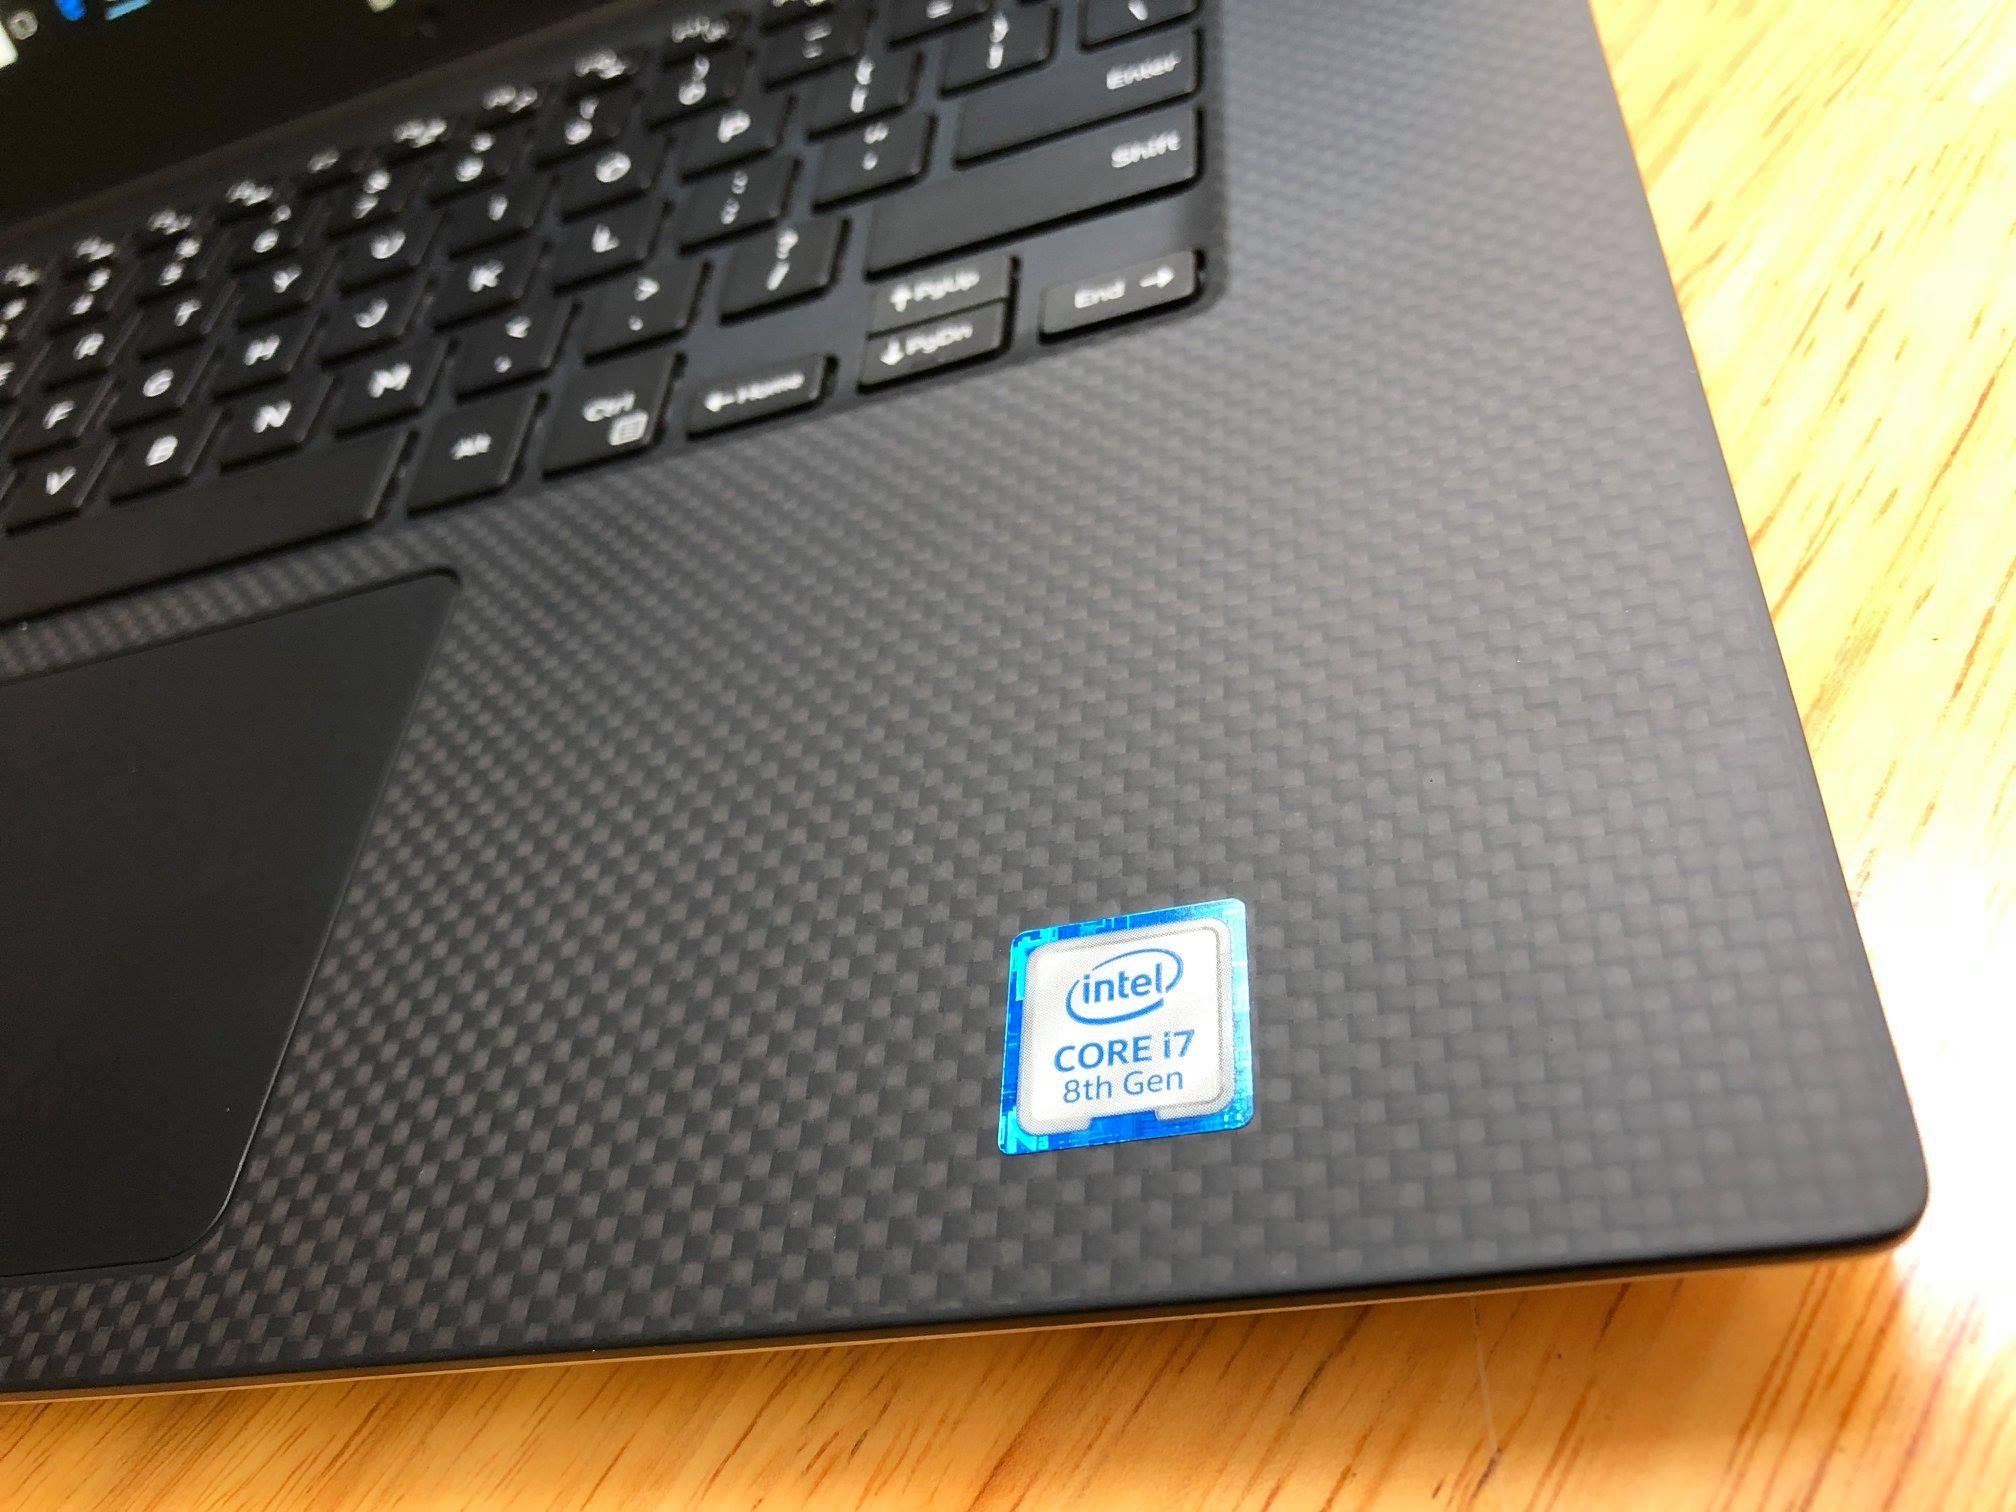 ==> bán 50 cái laptop Dell ... Core i3, i5, i7 ...máy đẹp, zin all. - 37